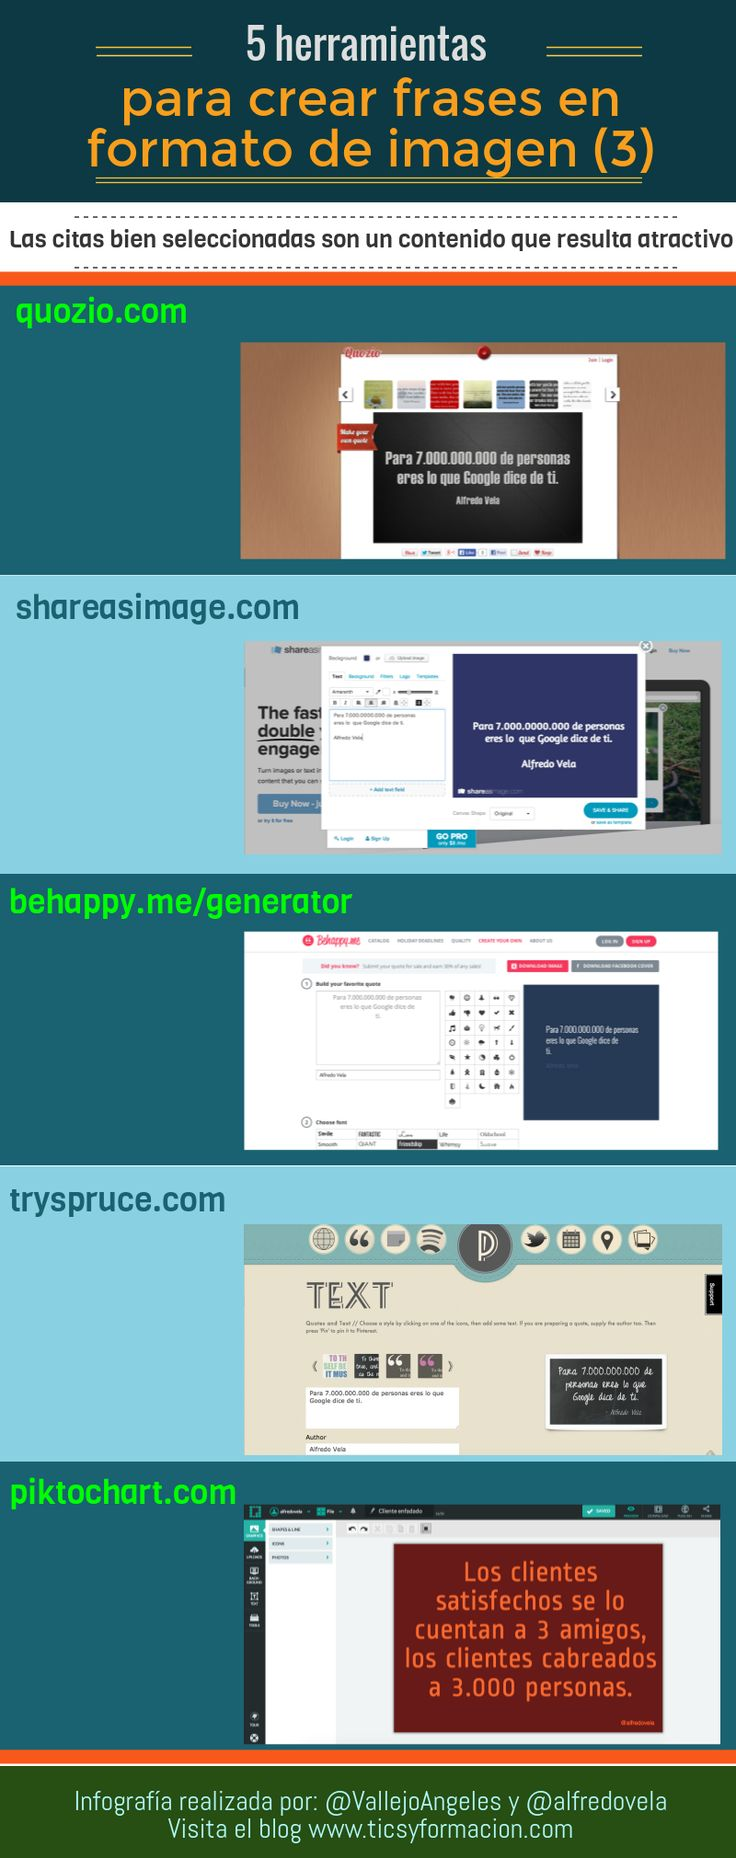 5 Herramientas online para crear frases en formato de imagen (3) #infografia #infographic #citas #quotes